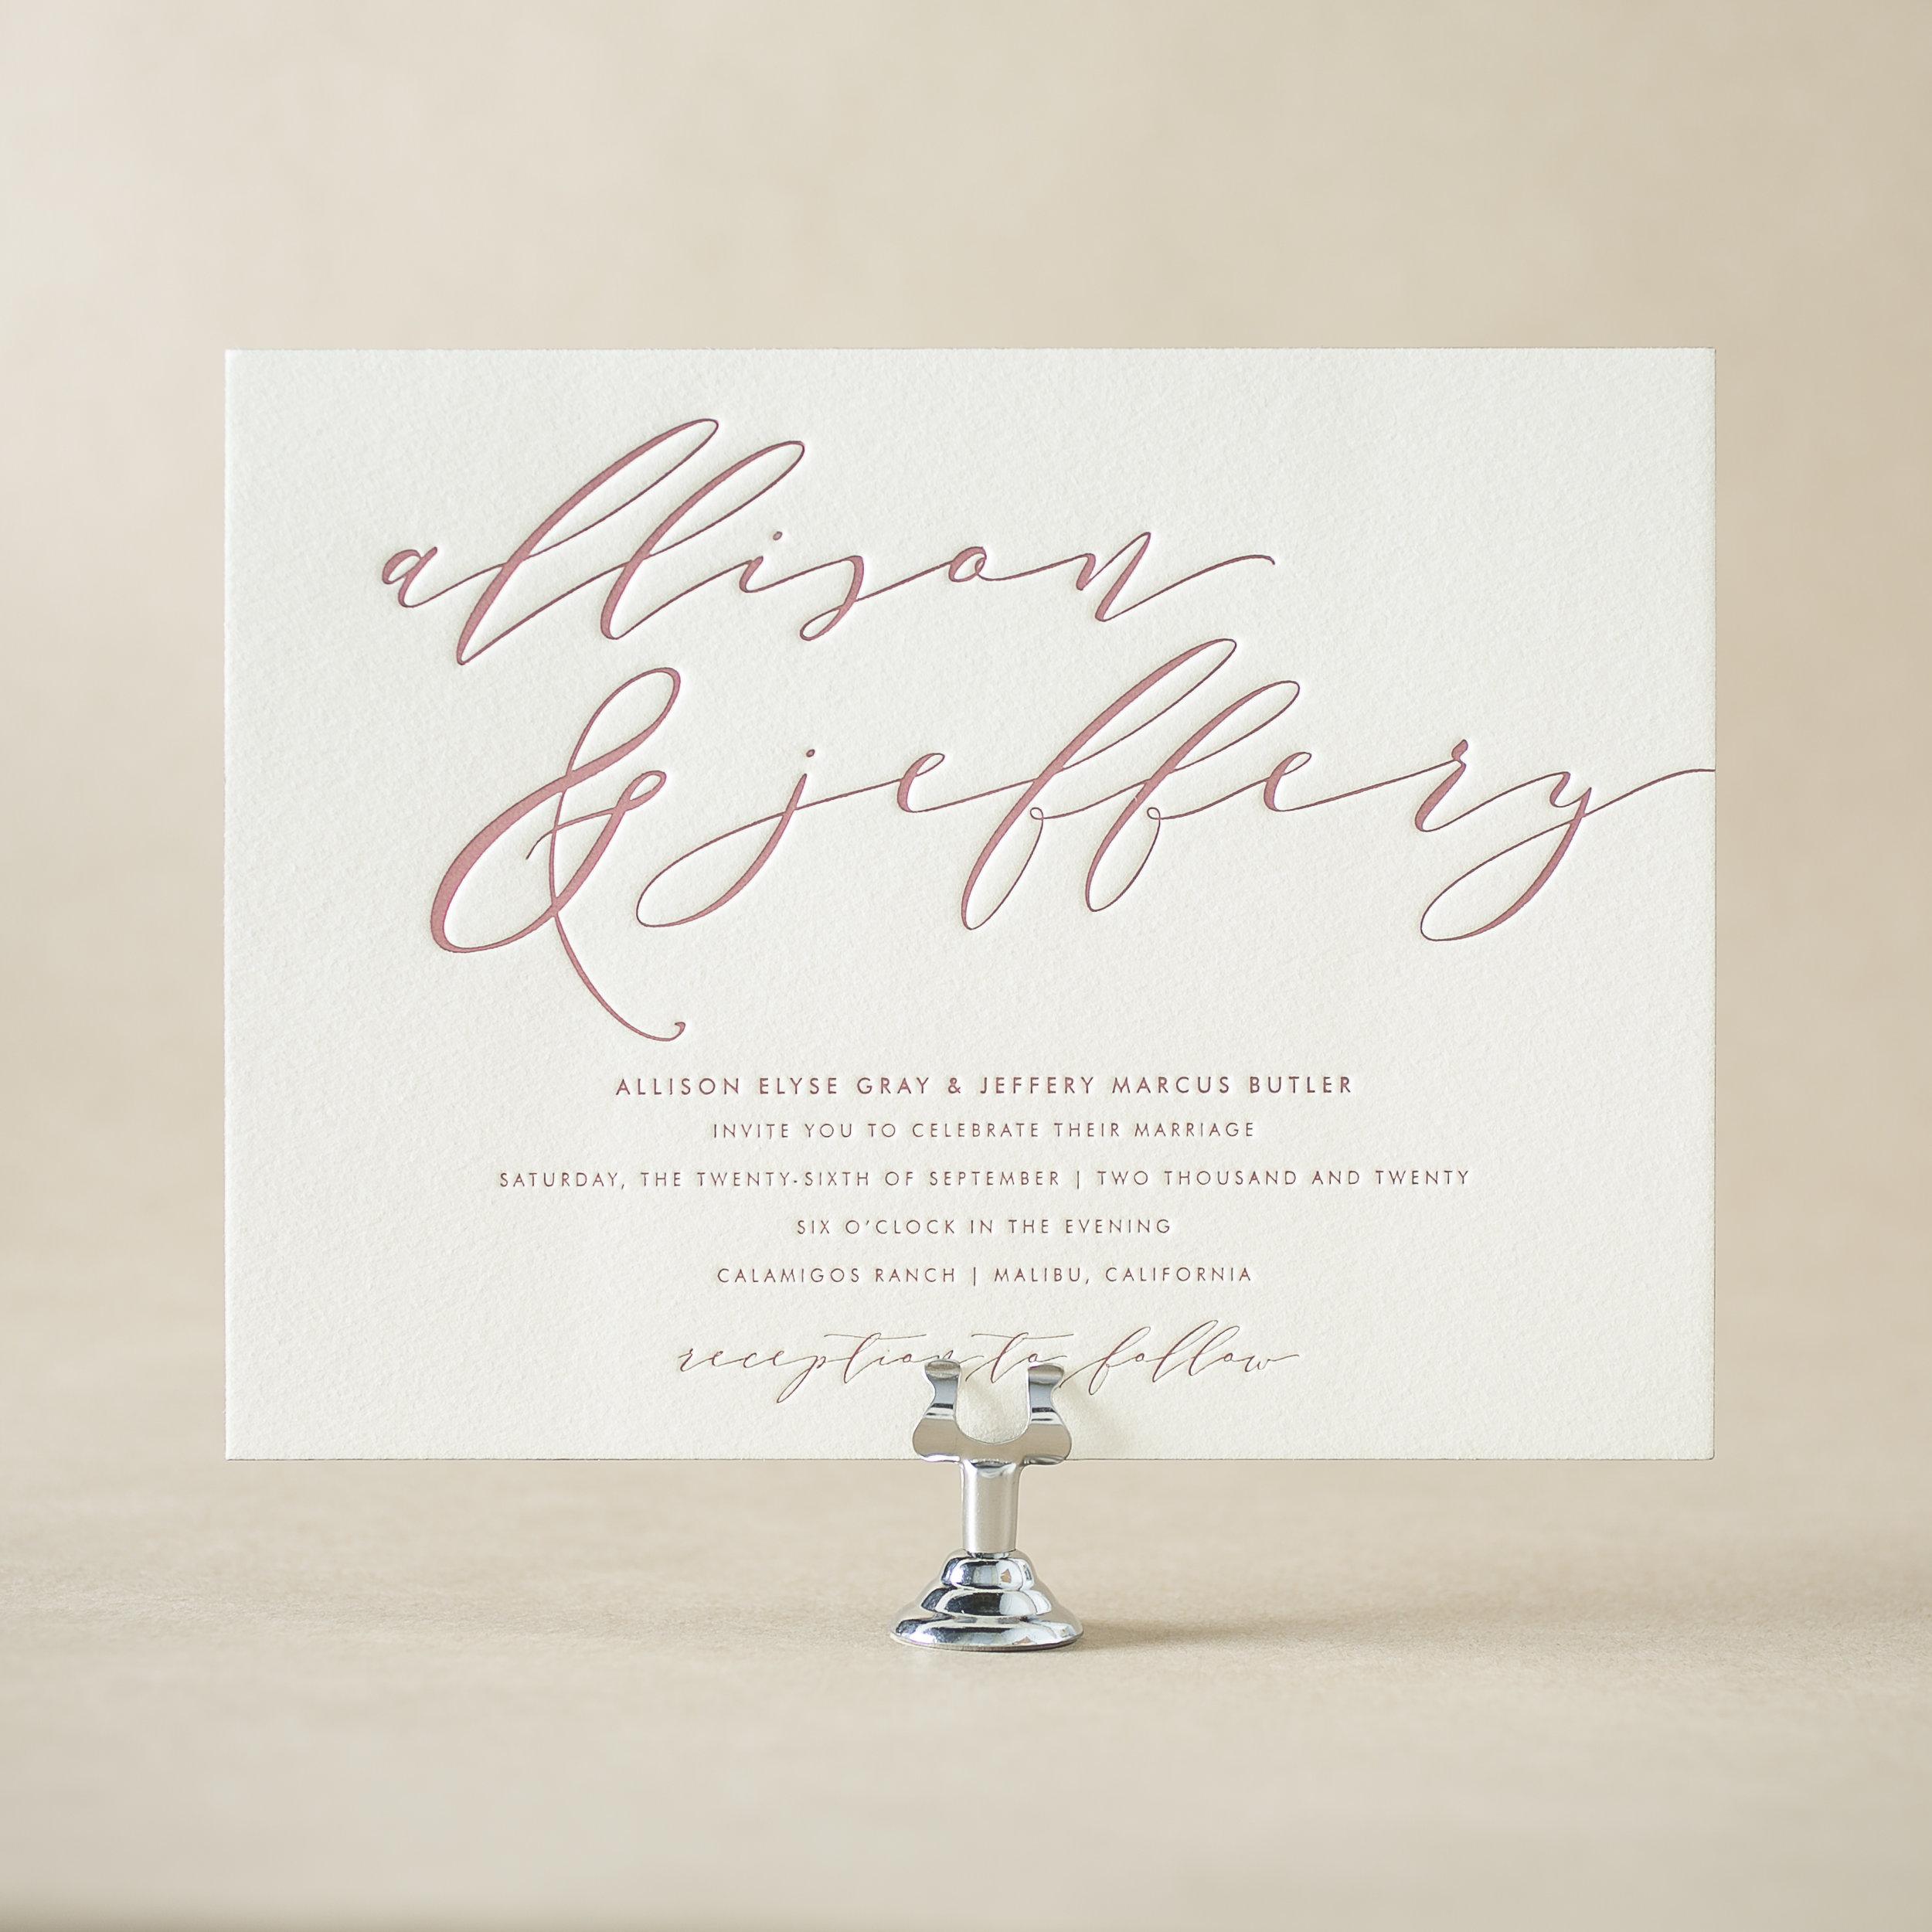 rexford-invitation.JPG